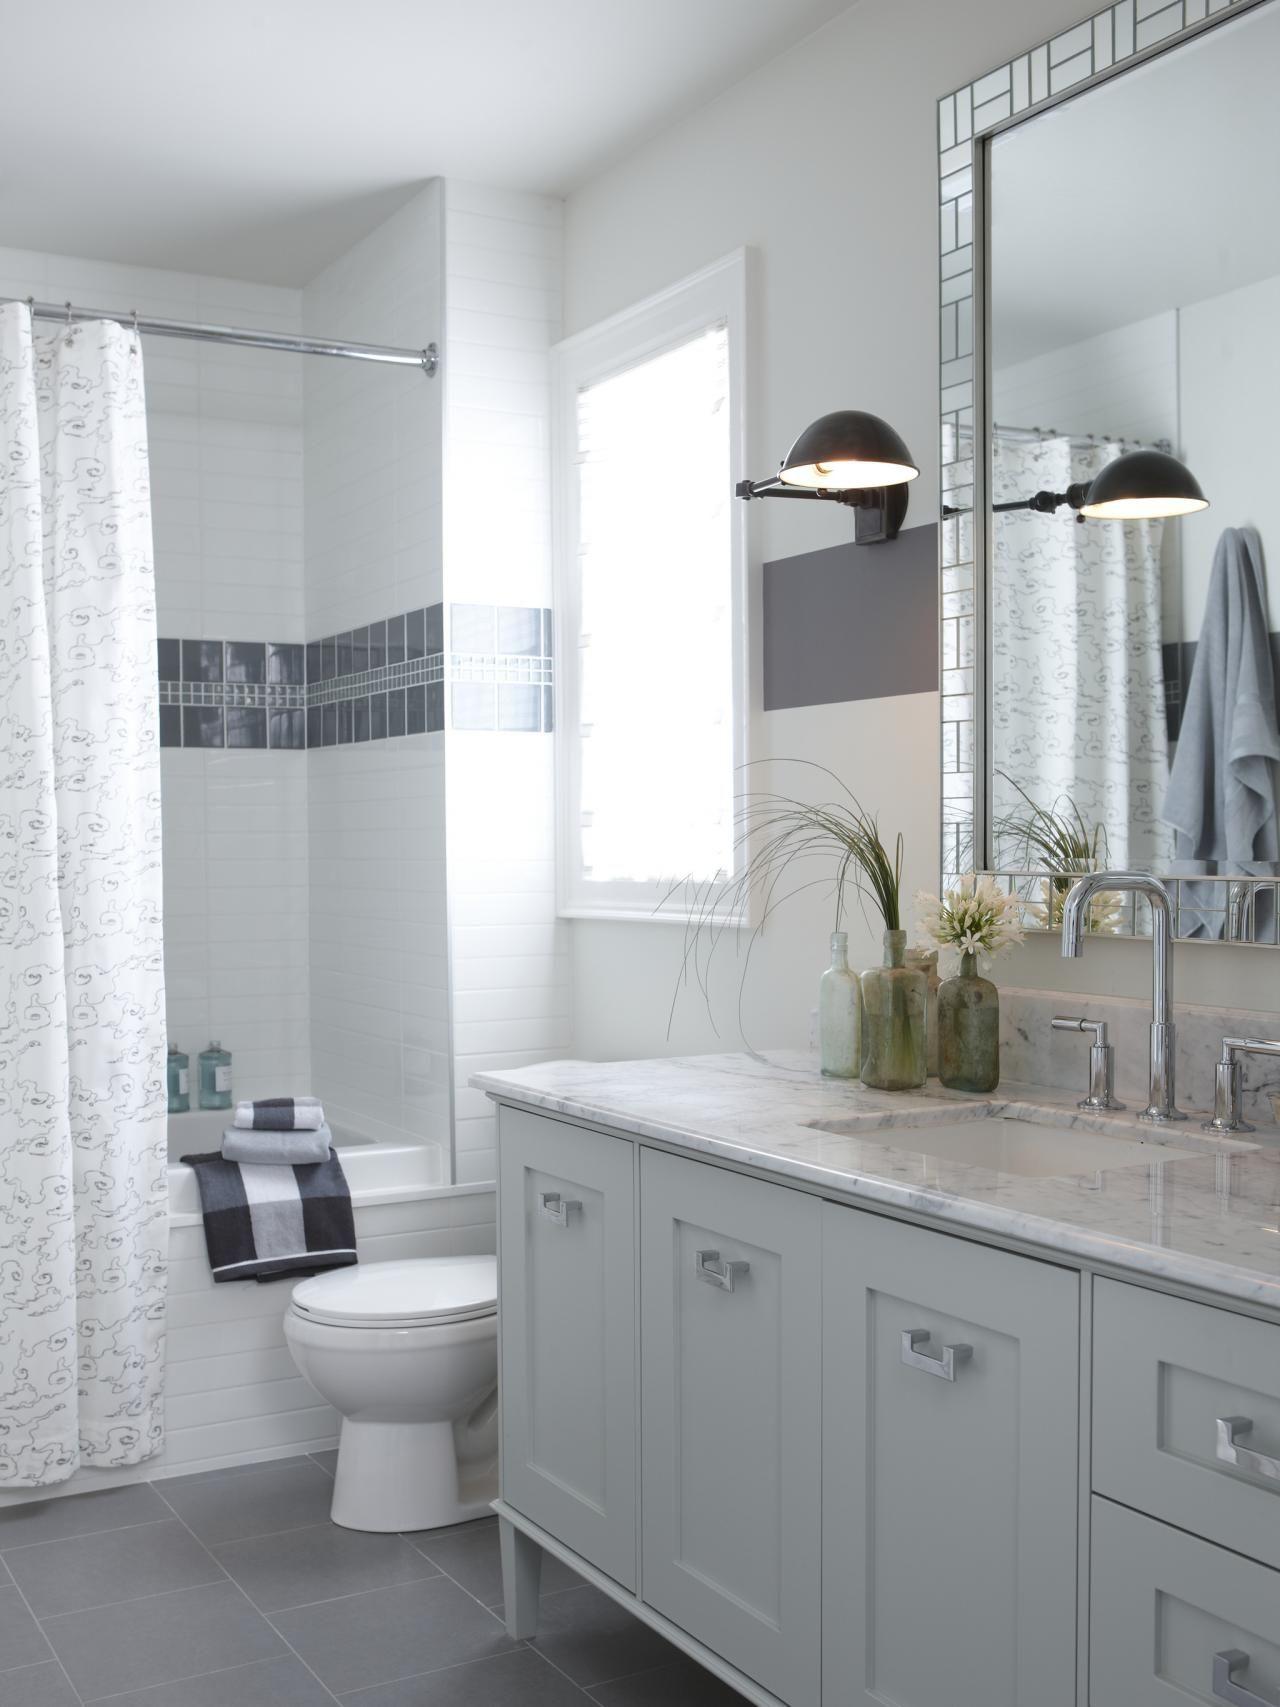 Lovely Western Bathroom Accessories Wallpaper - Bathroom Design ...